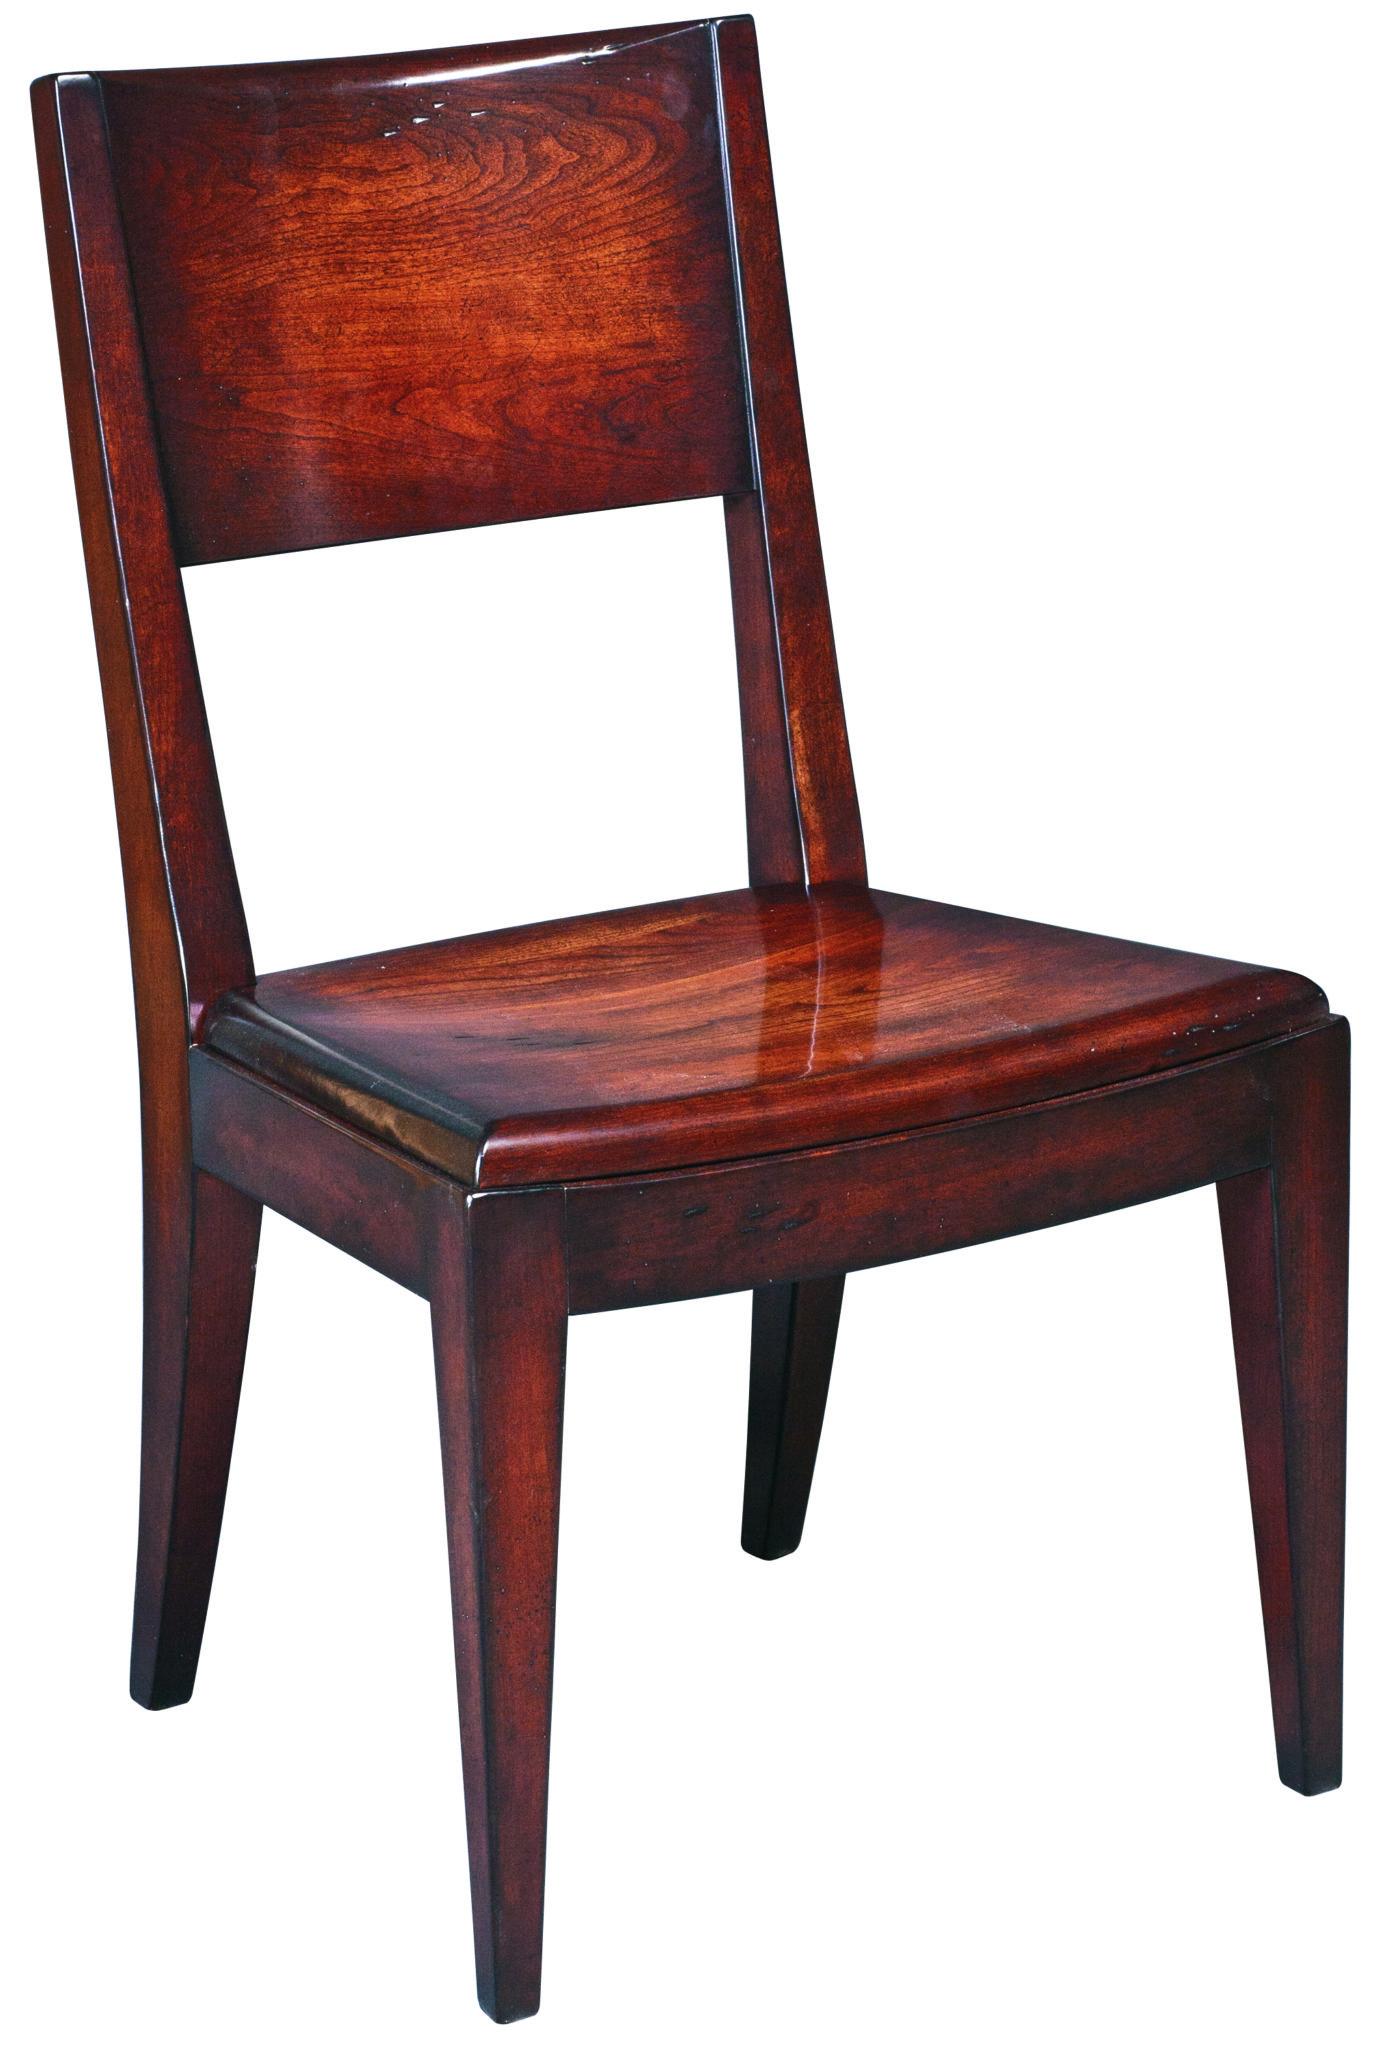 388W-Barkeley-Side-Chair.jpg